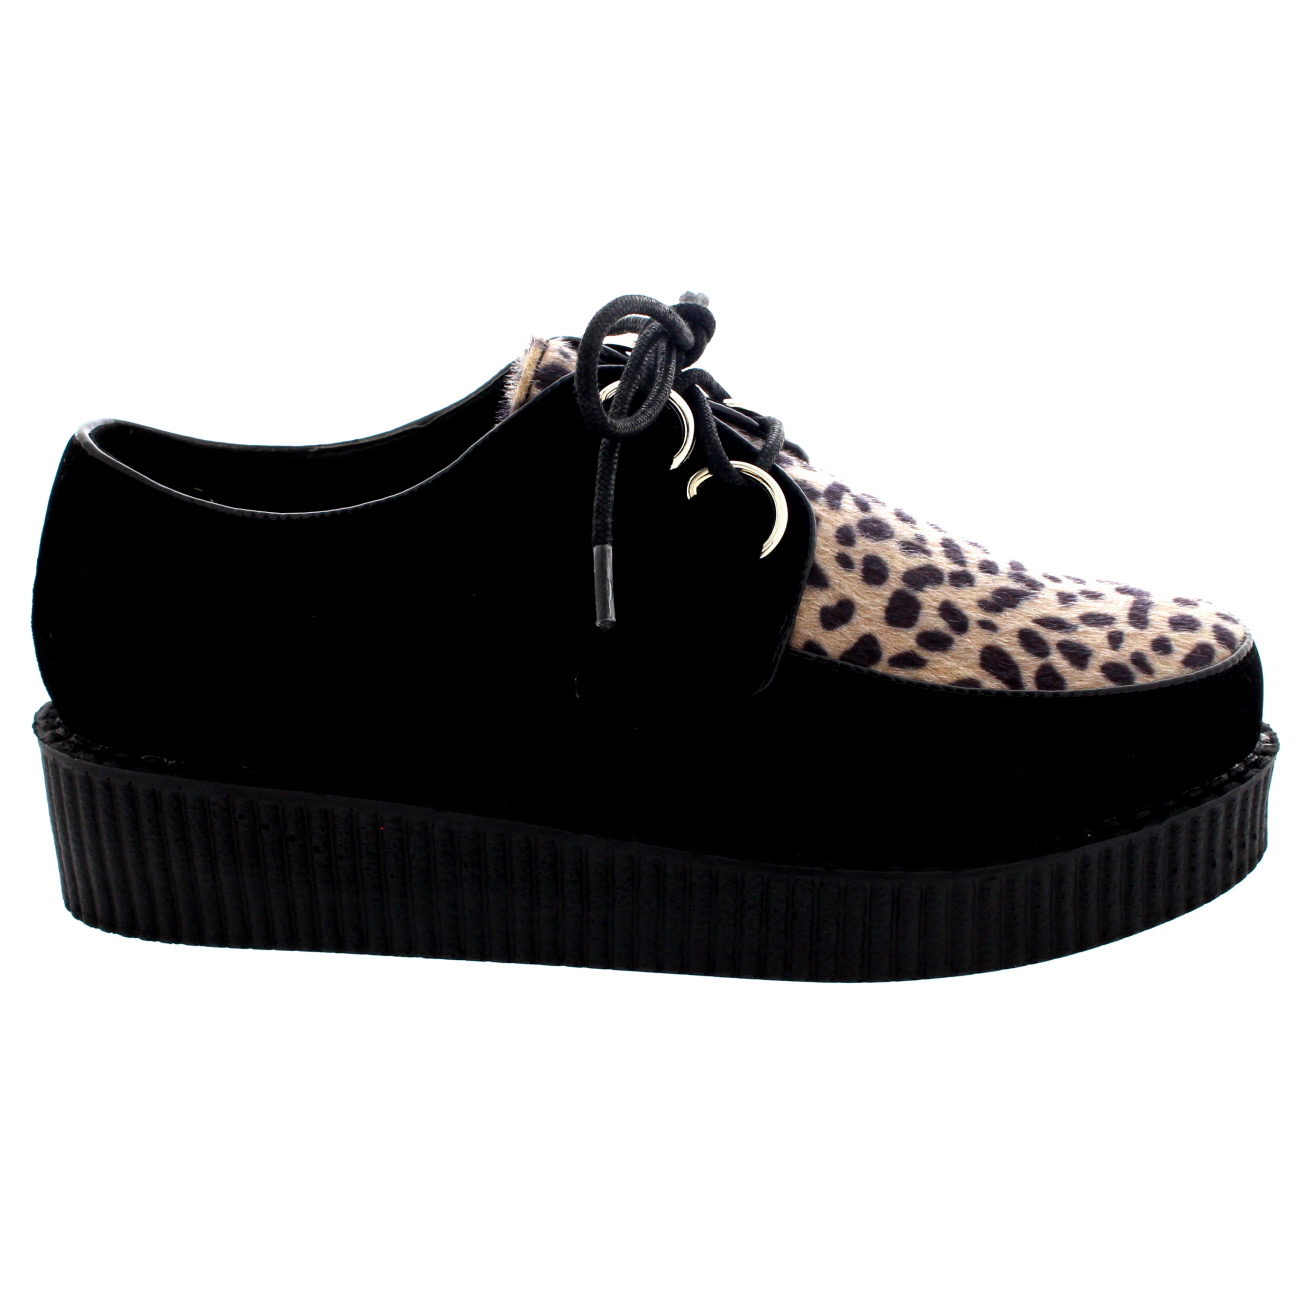 Brothel Creeper Shoes Uk